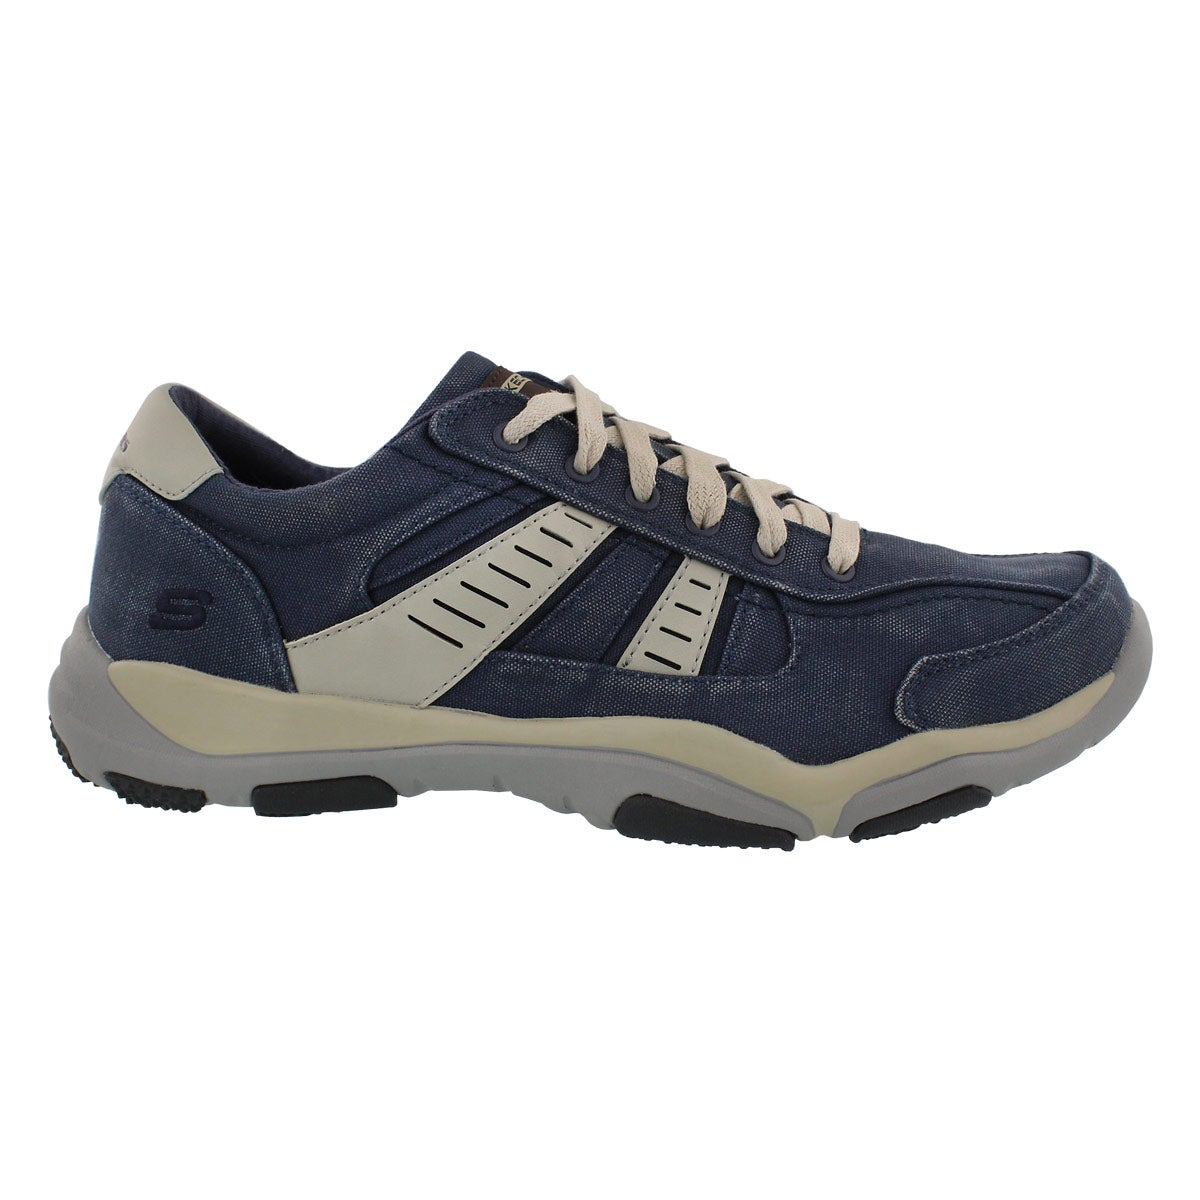 Mns Larson Masson navy slip on sneaker